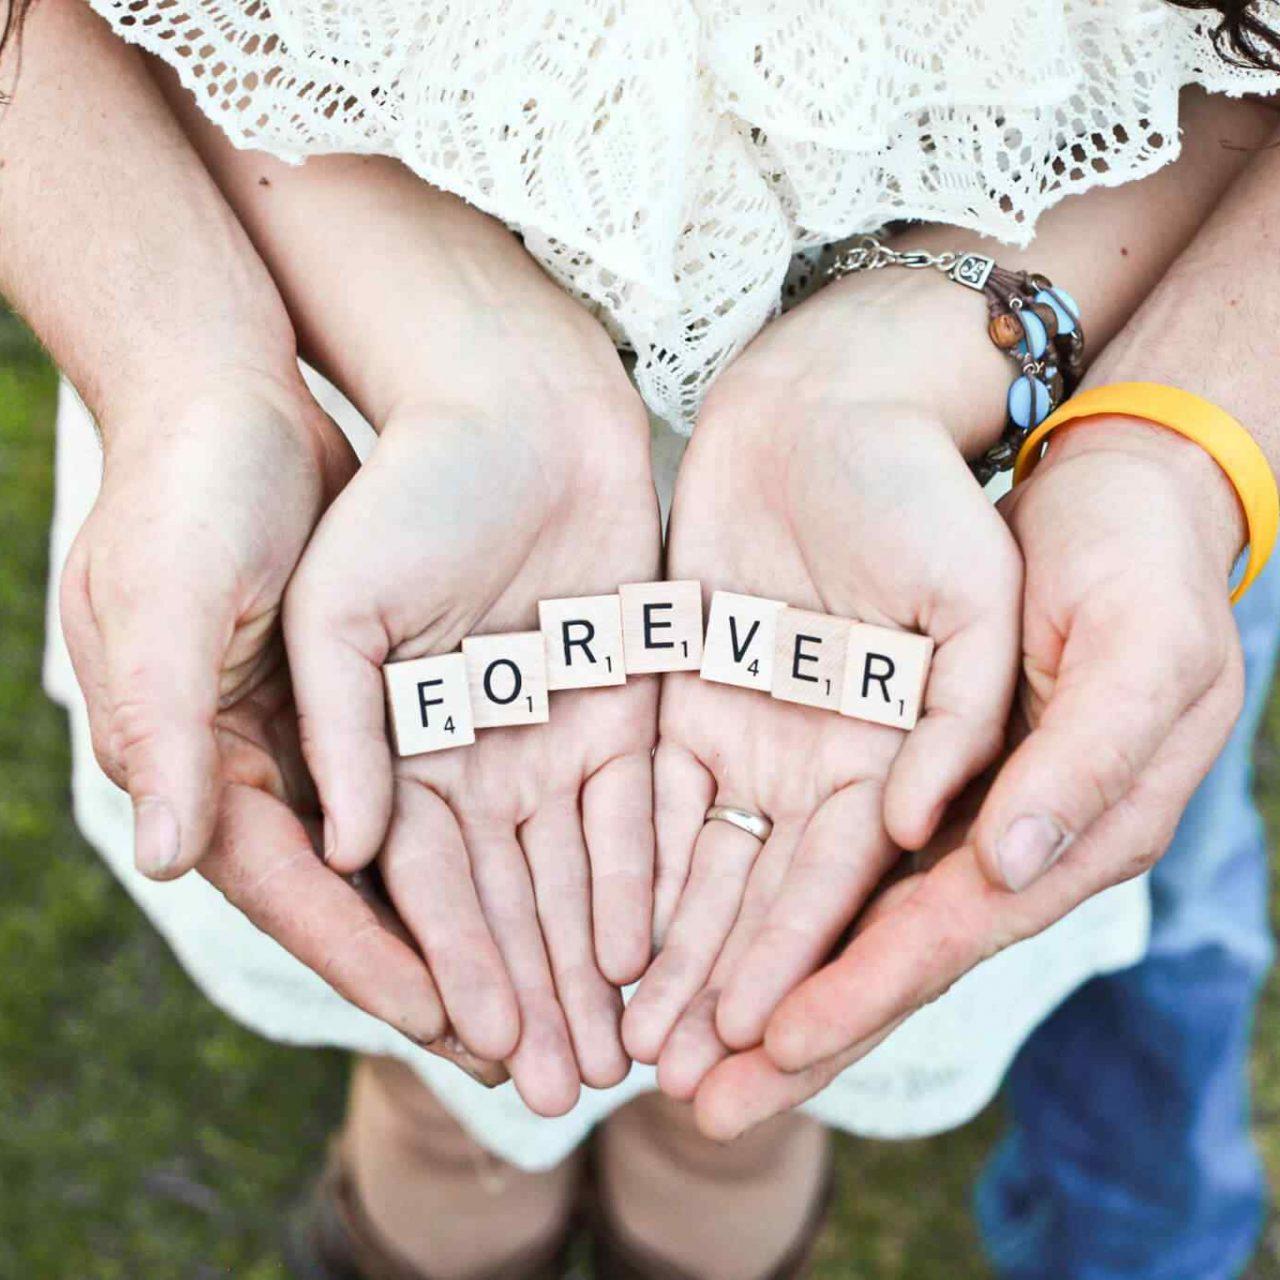 http://mirelasula.com/wp-content/uploads/2018/01/img-event-marriage-03-1280x1280.jpg